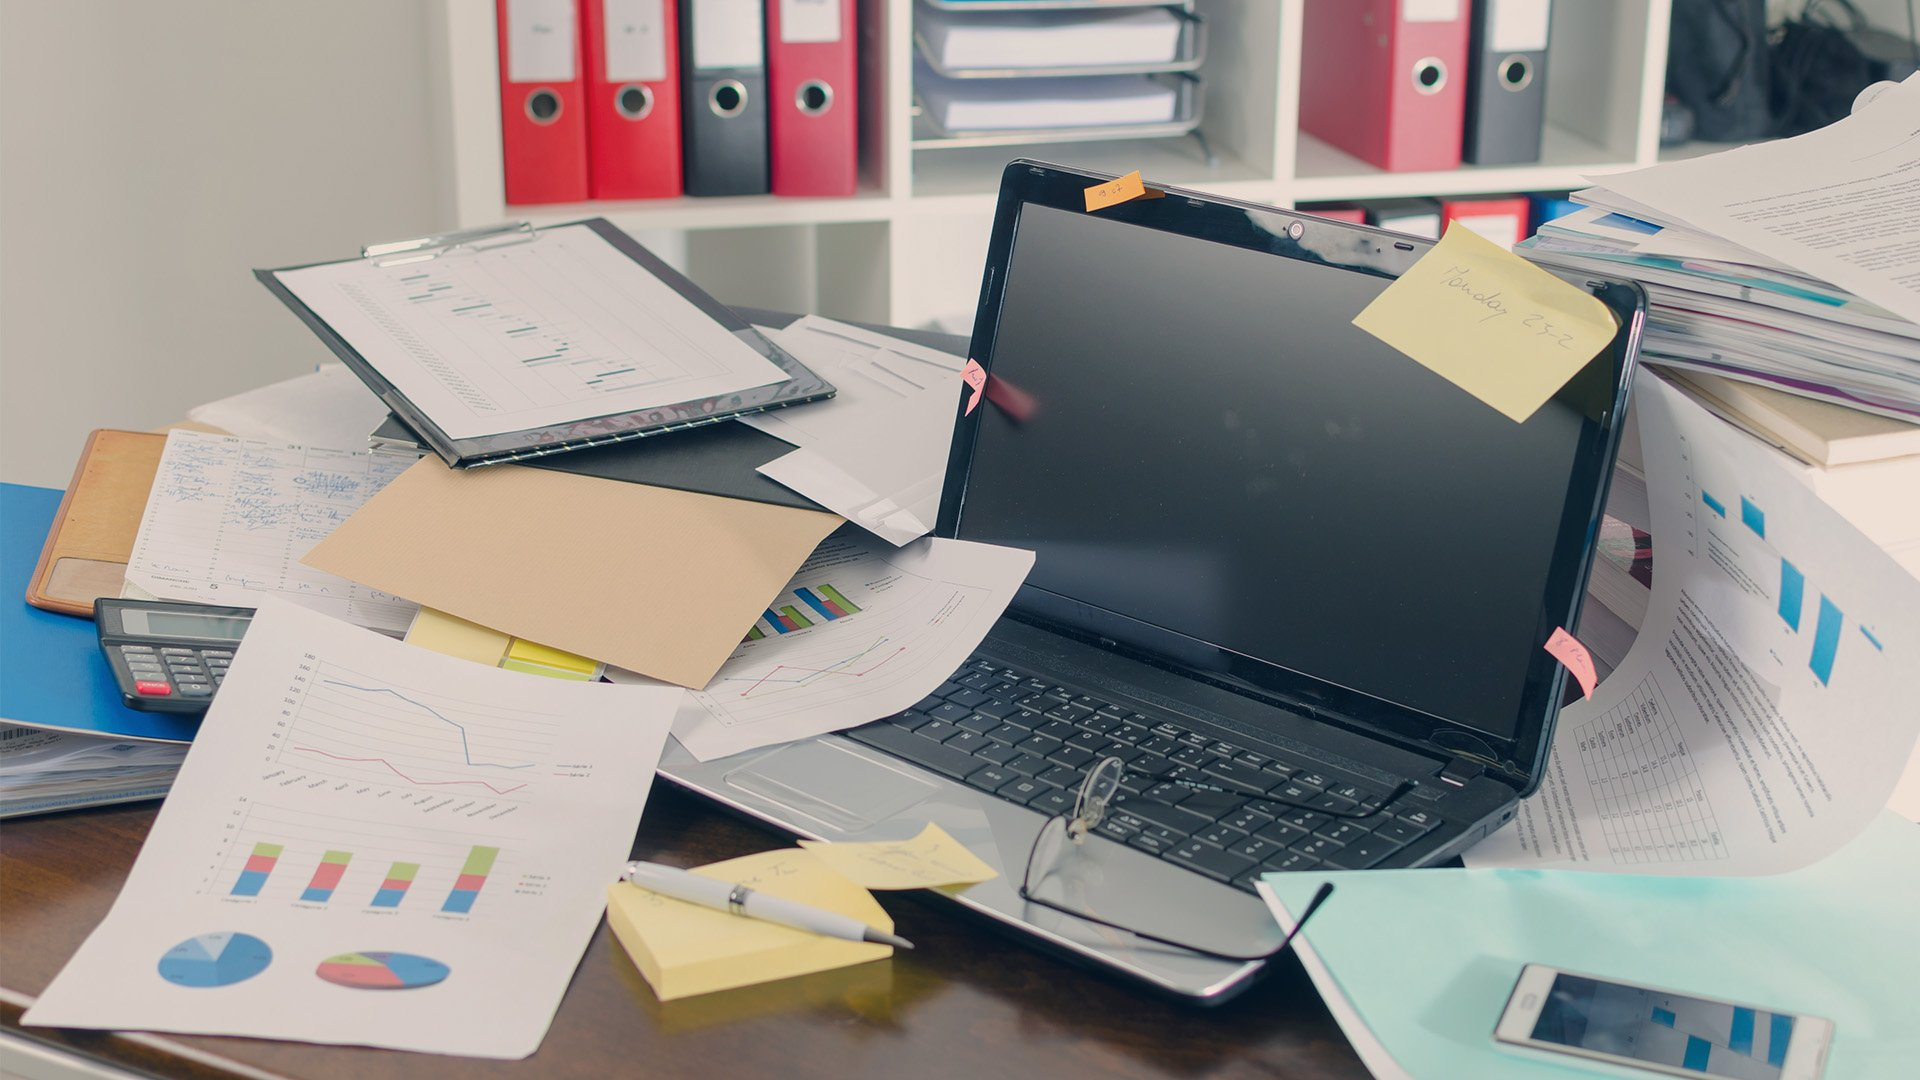 Why an untidy desk may hide a creative mind | Teamwork.com High Performance Blog